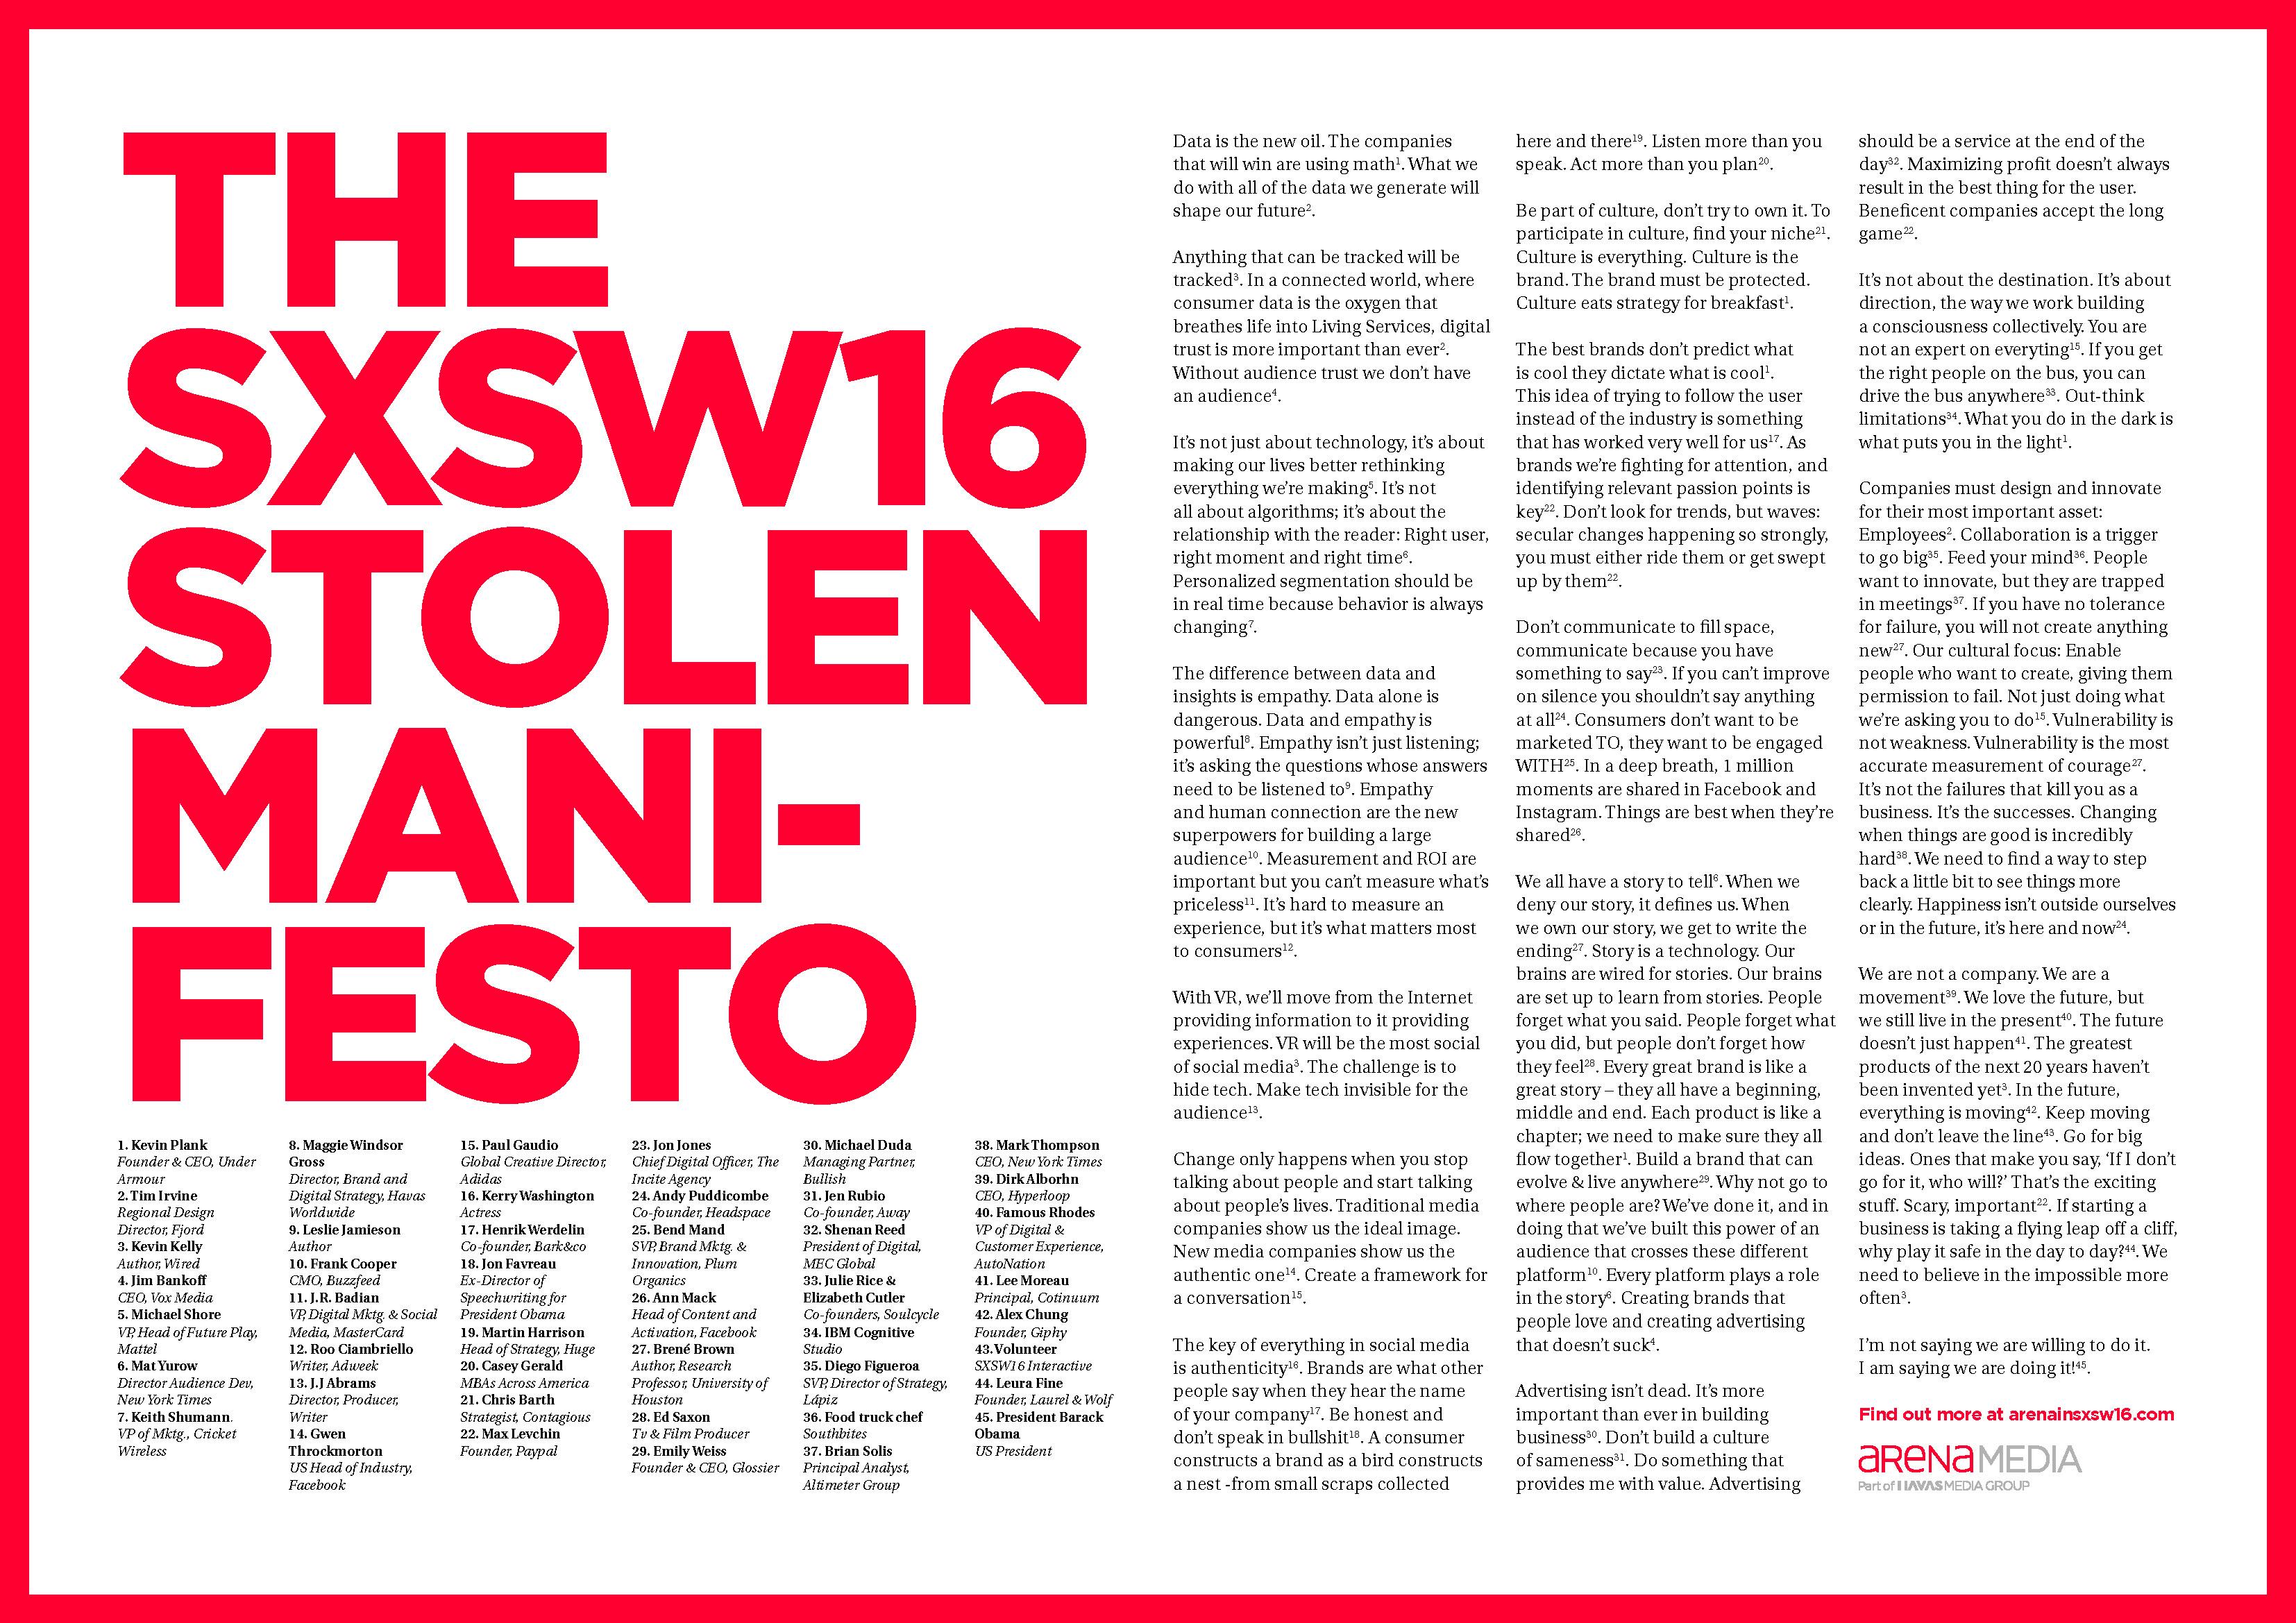 SXSW16_Arena_The_SXSW16_Stolen_Manifesto_def